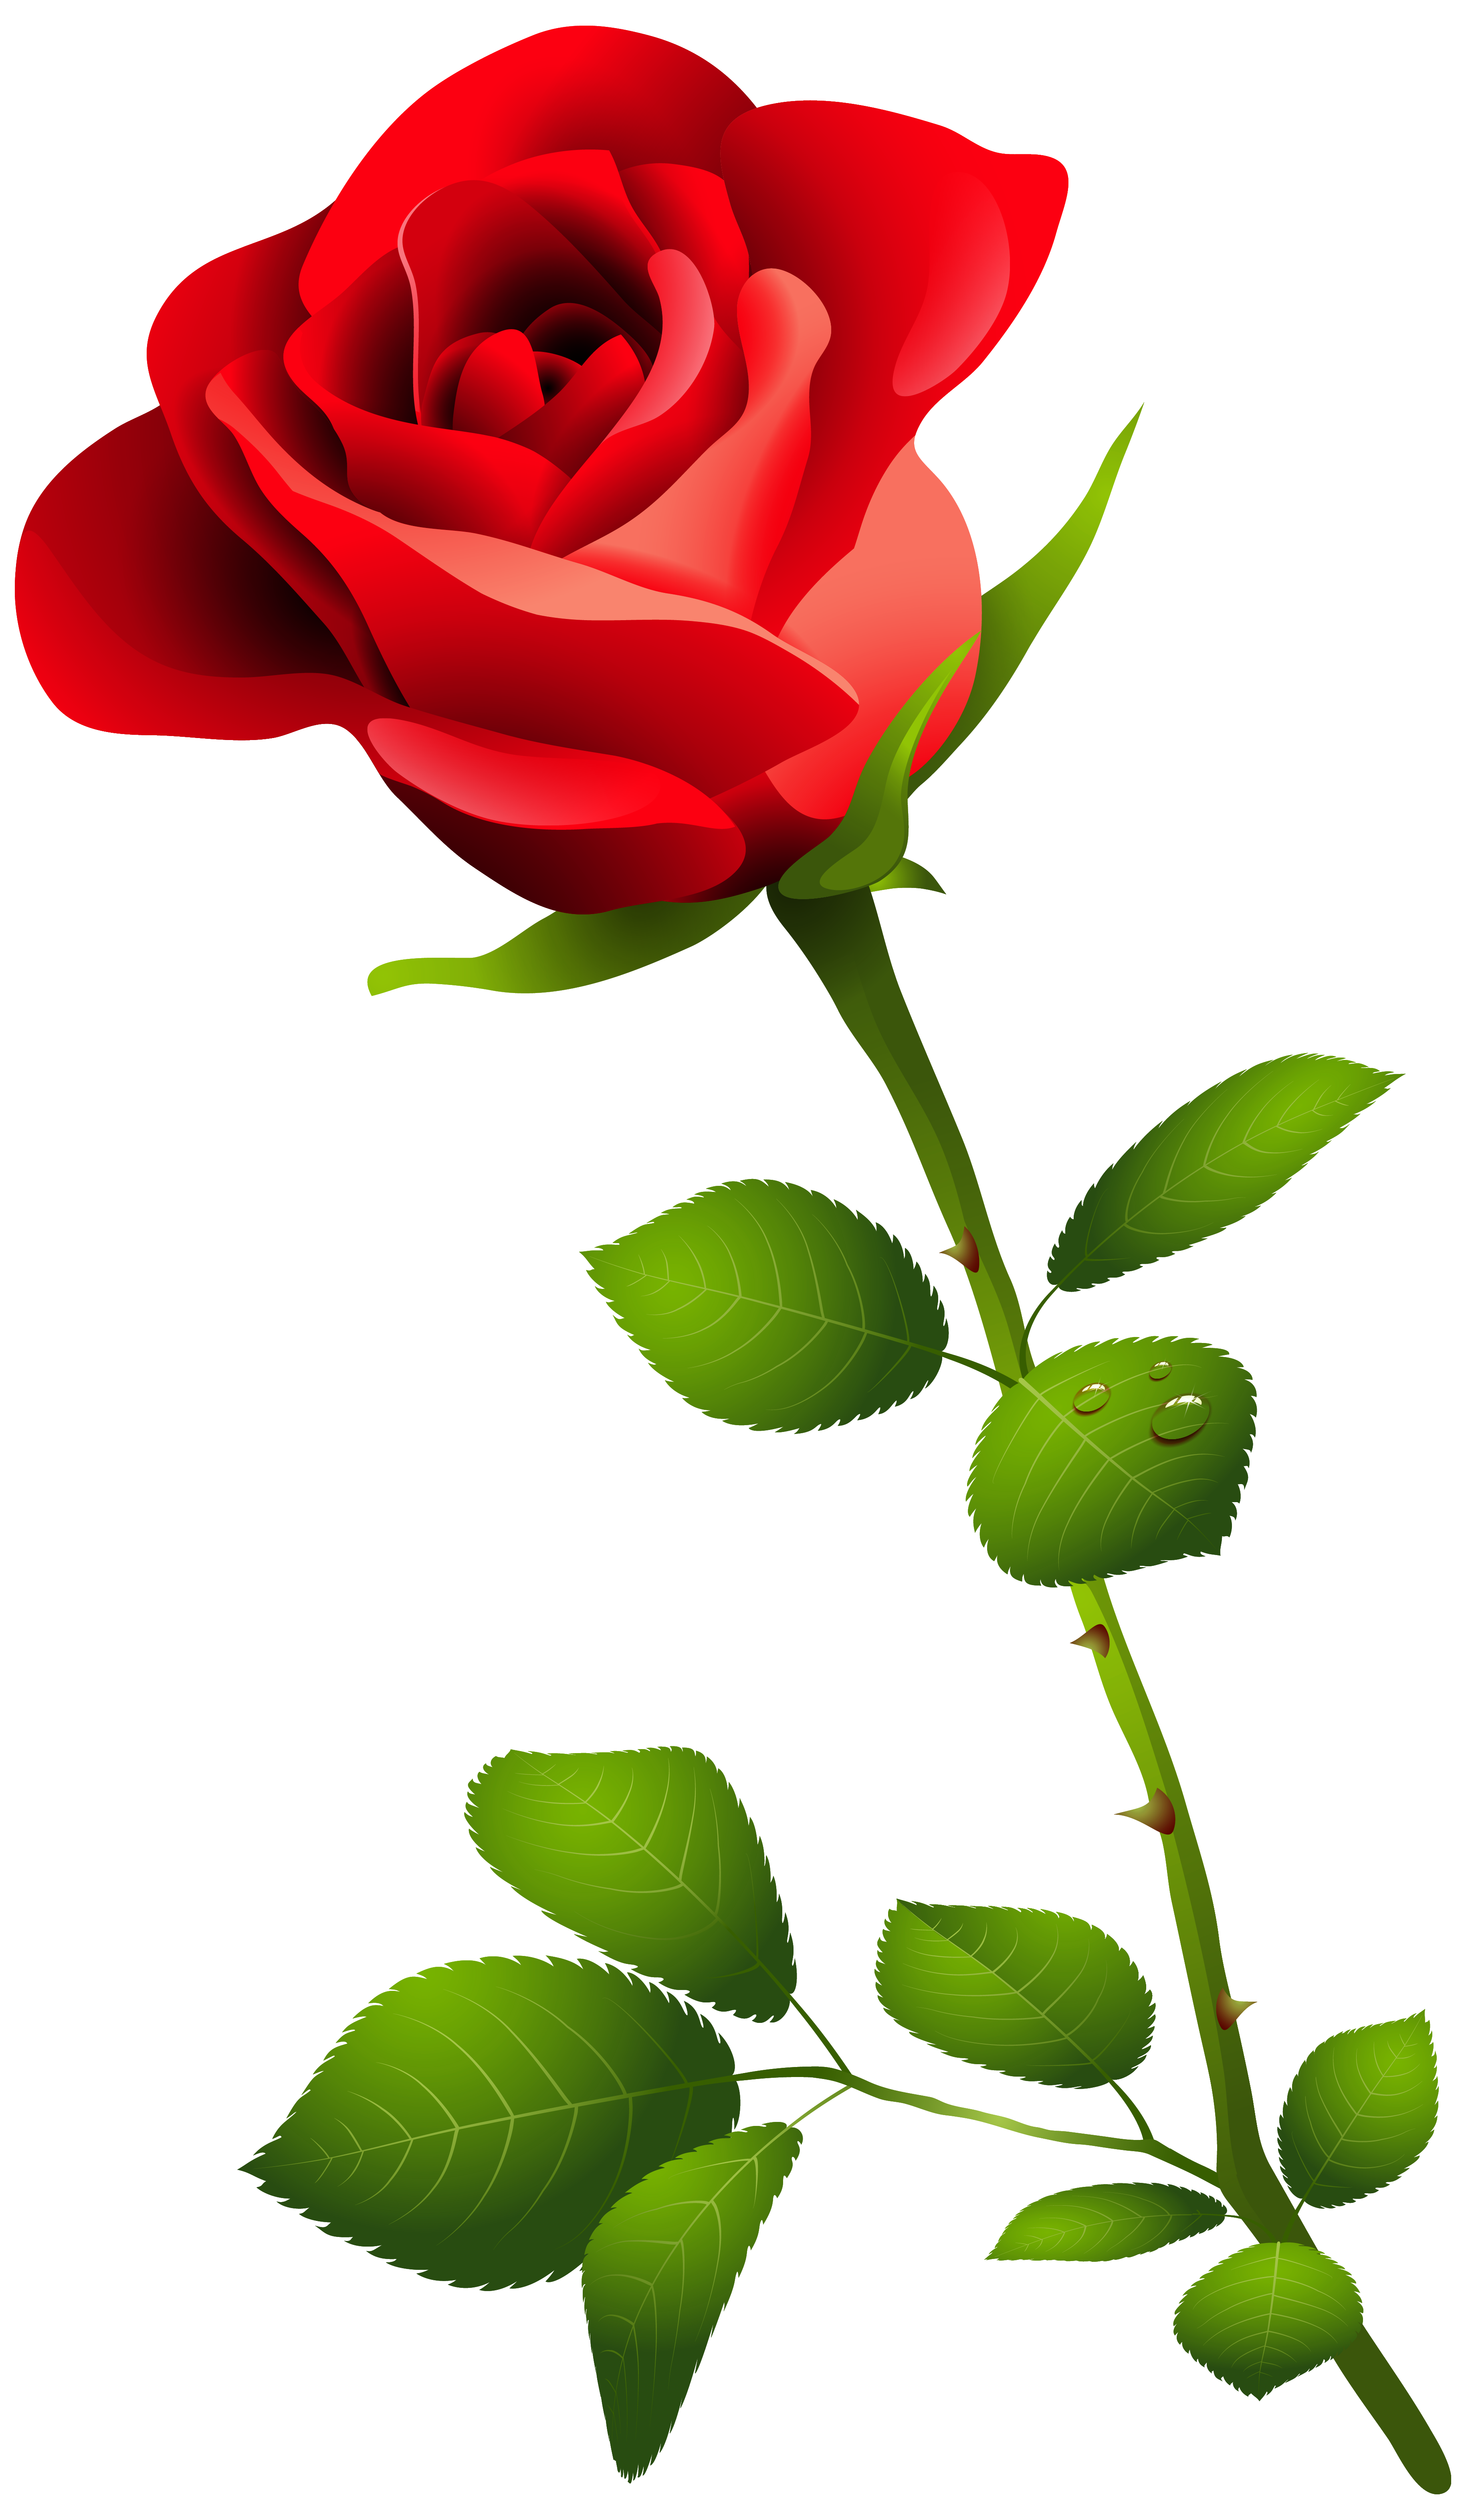 Clip Art Pink Rose Pink Rose With-Clip Art Pink Rose pink rose with-1